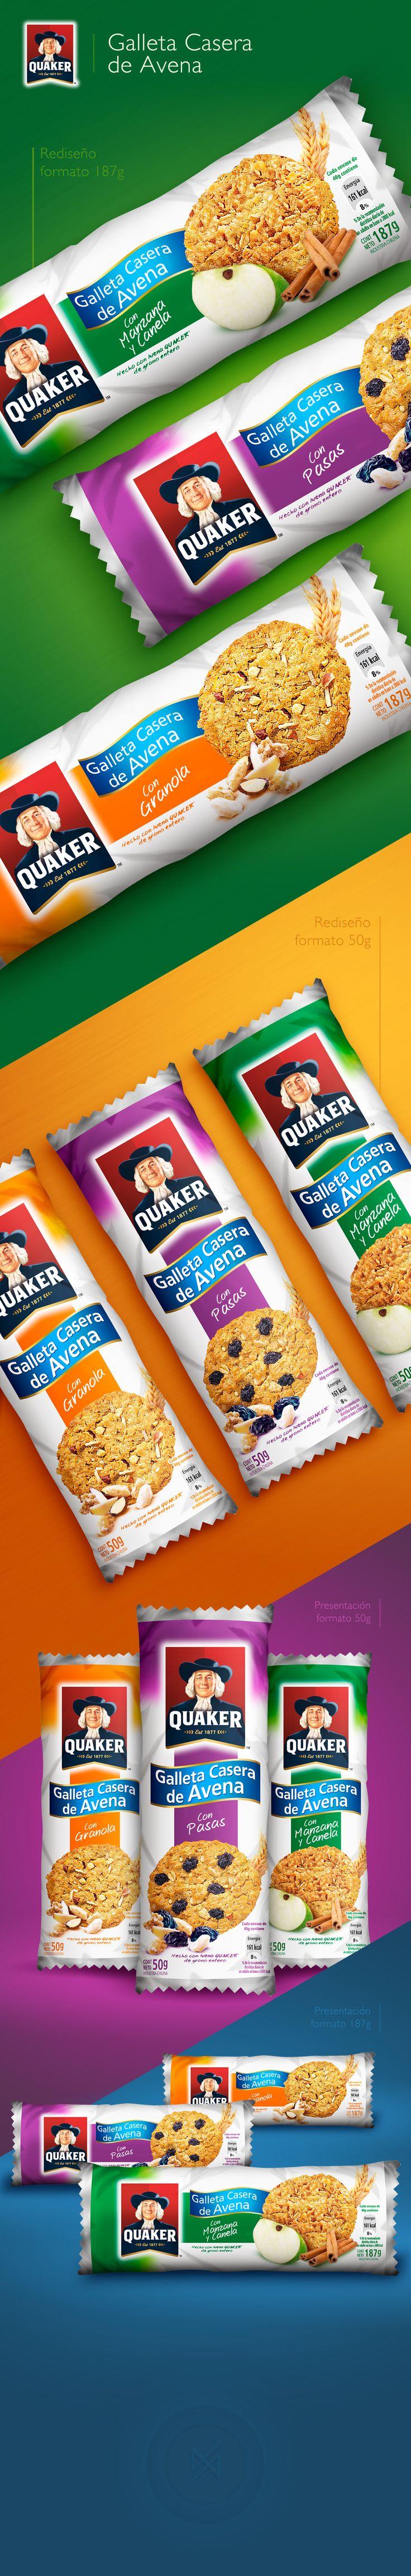 Packaging | Galleta Casera de Avena Quaker on Behance